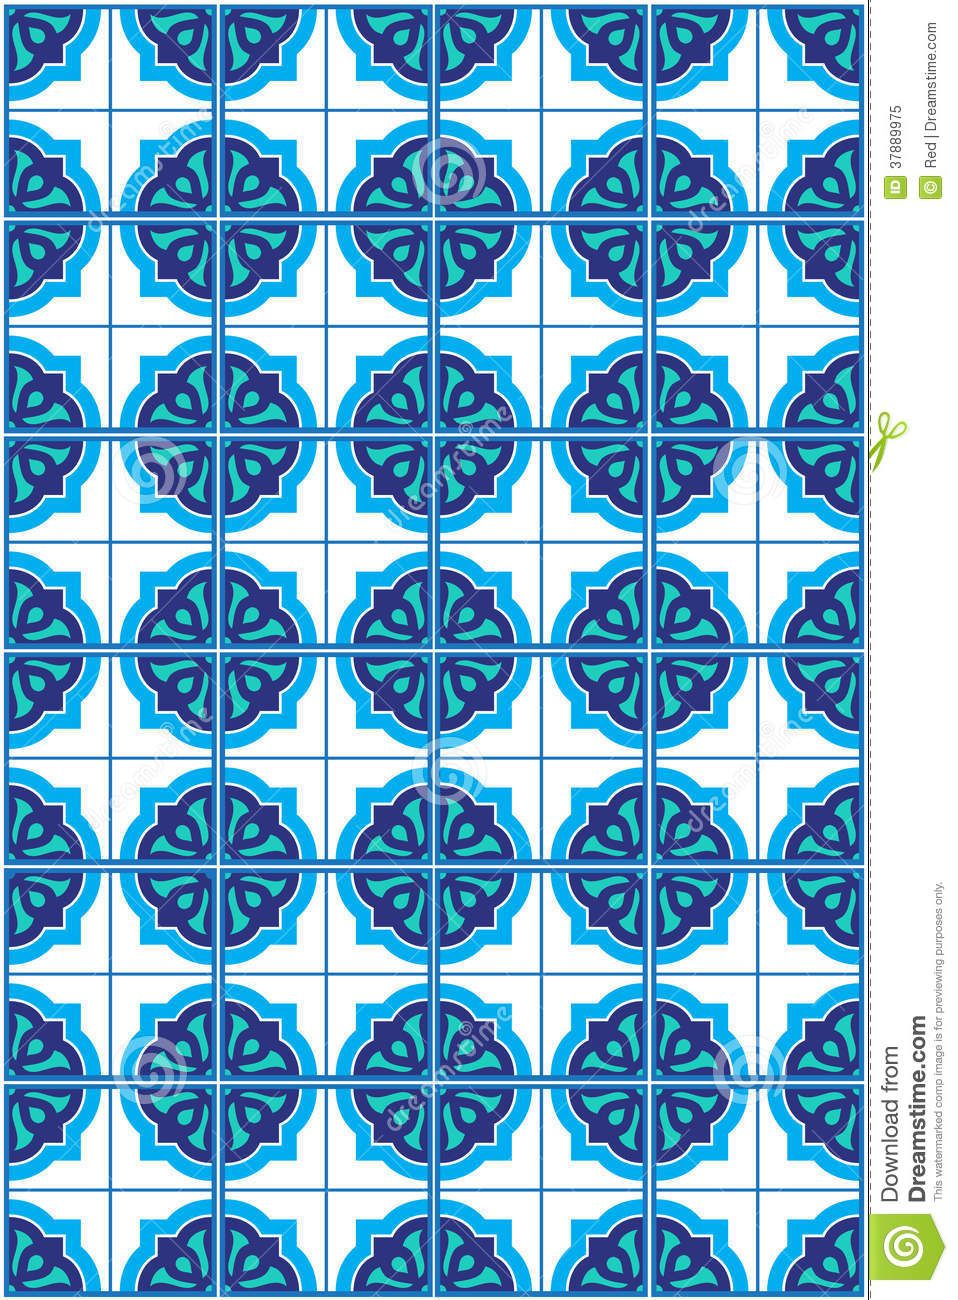 Blue Moroccan Mosaic Tile Pattern | tiles | Pinterest | Tile ...